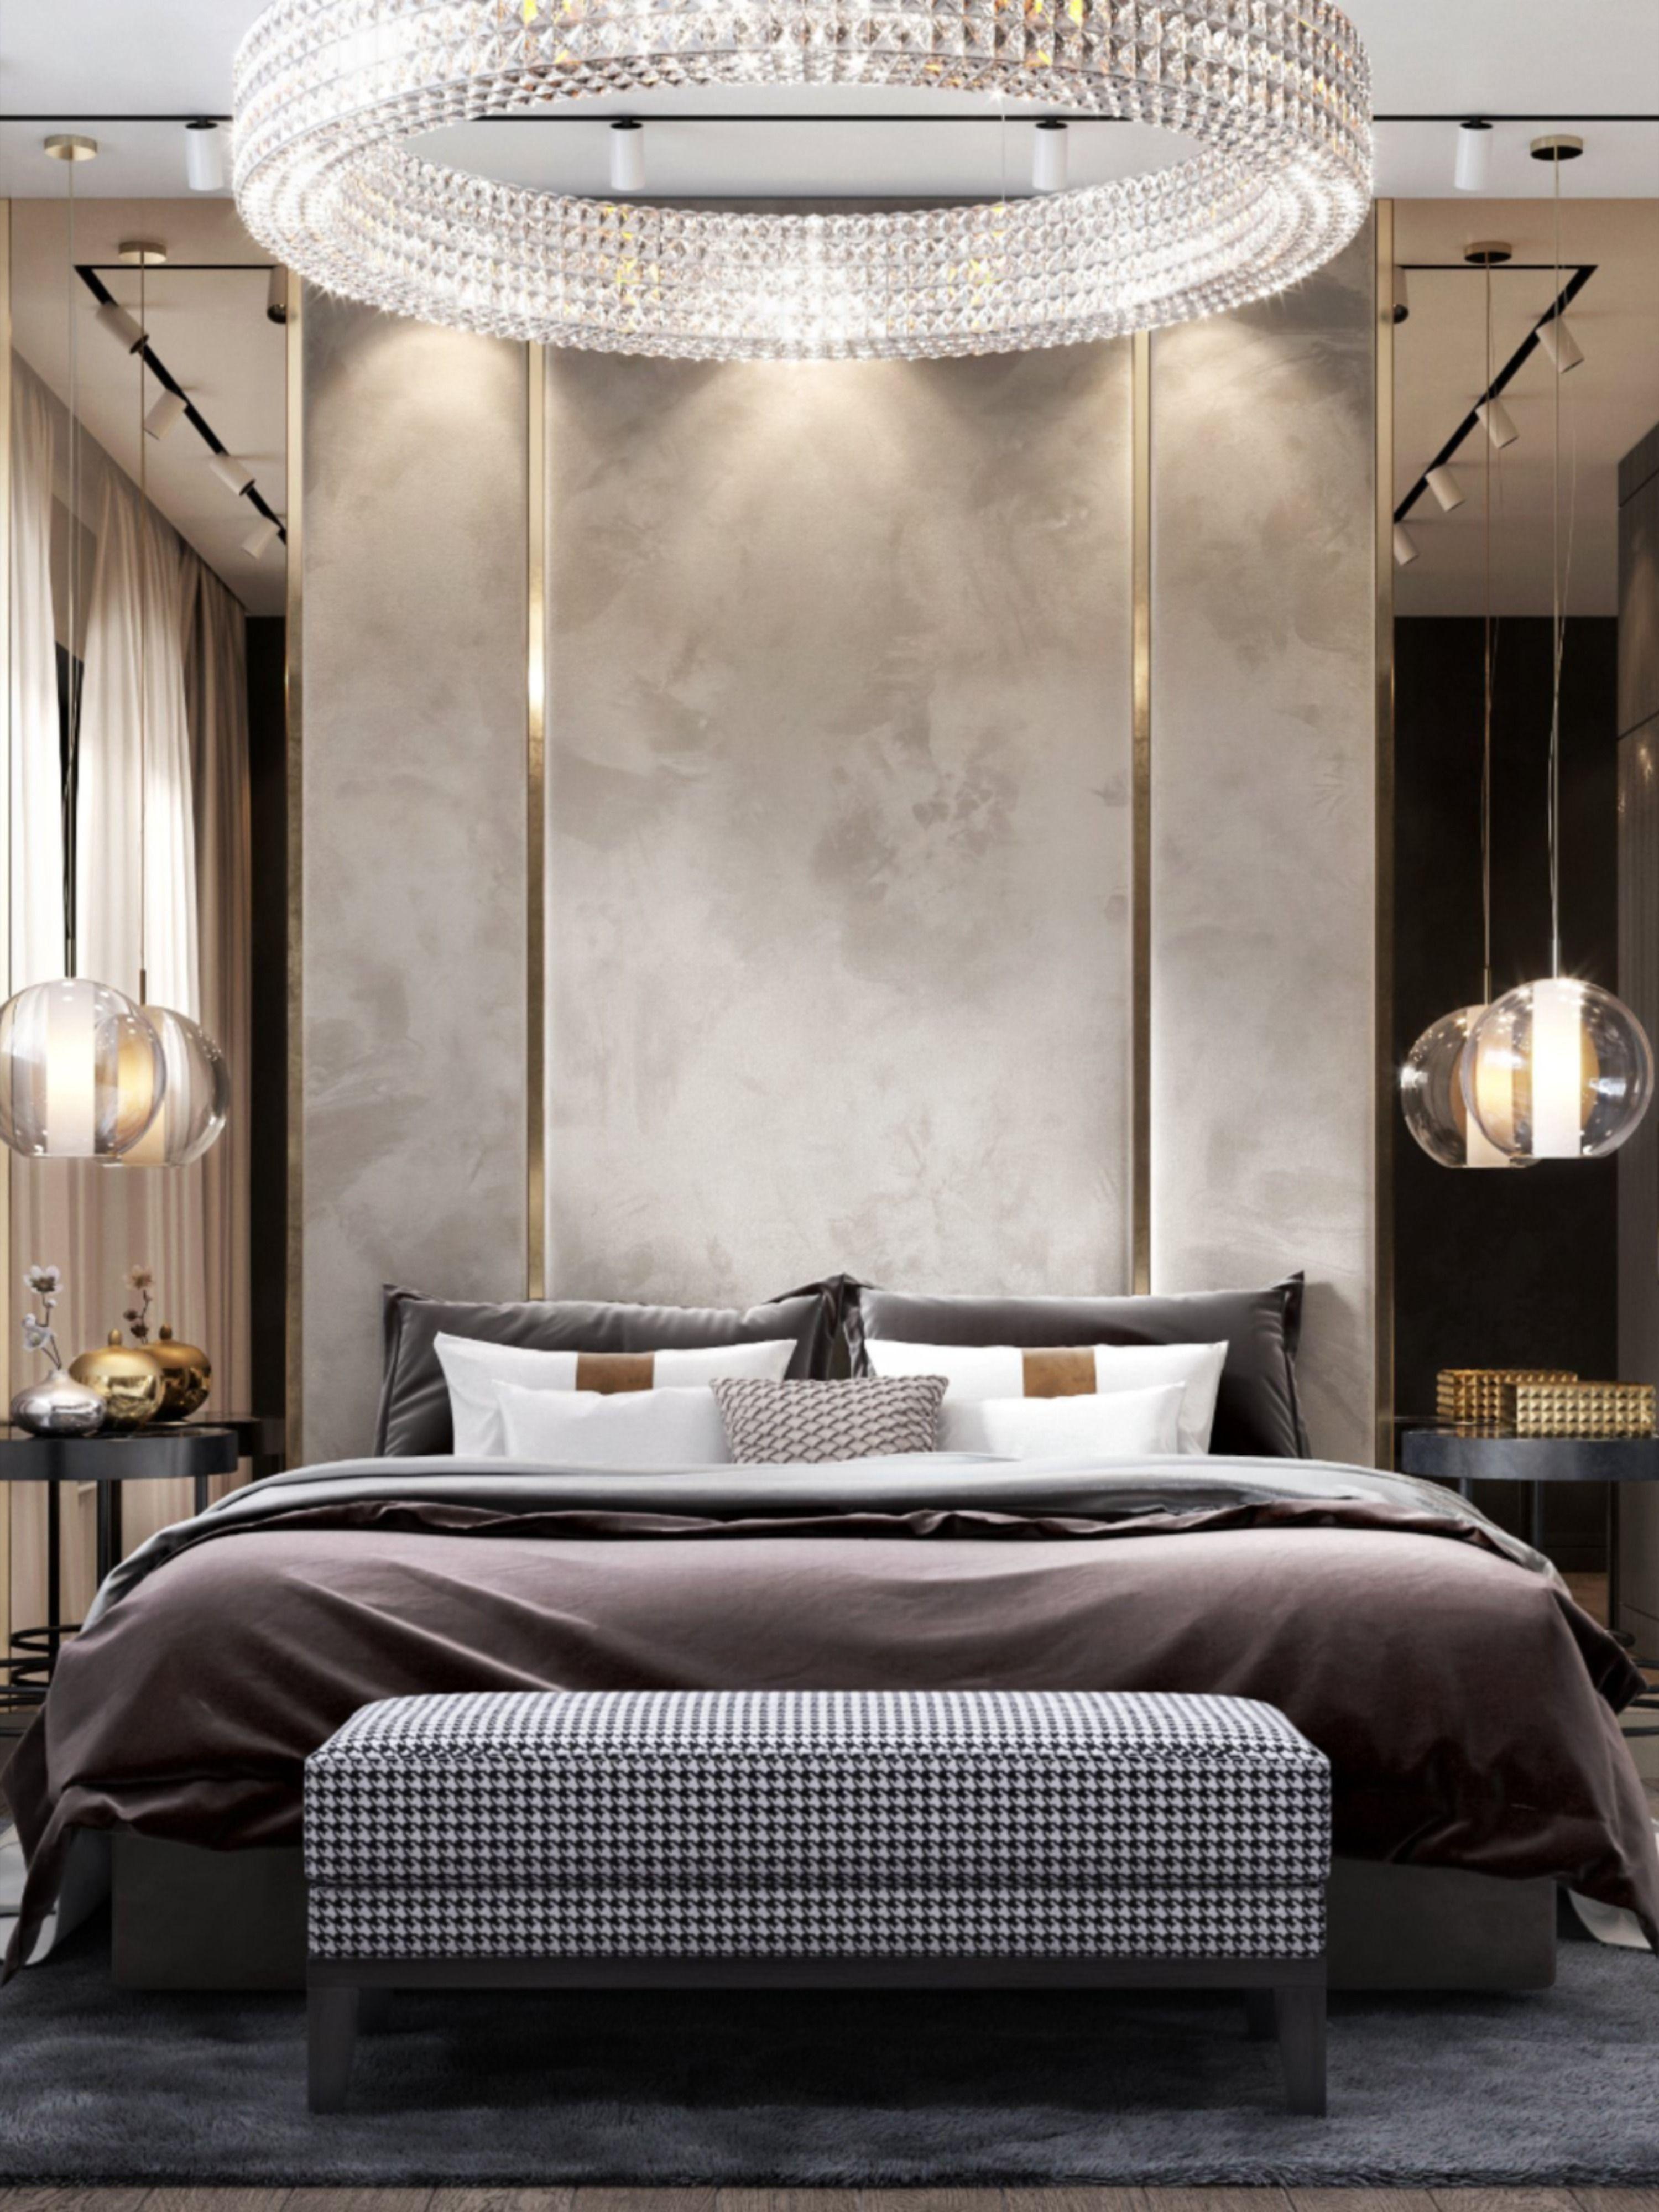 Get The Look Of These Modern Bedroom Designs In 2021 Master Bedroom Interior Bedroom Furniture Design Bedroom Interior Bedroom bad design 2021